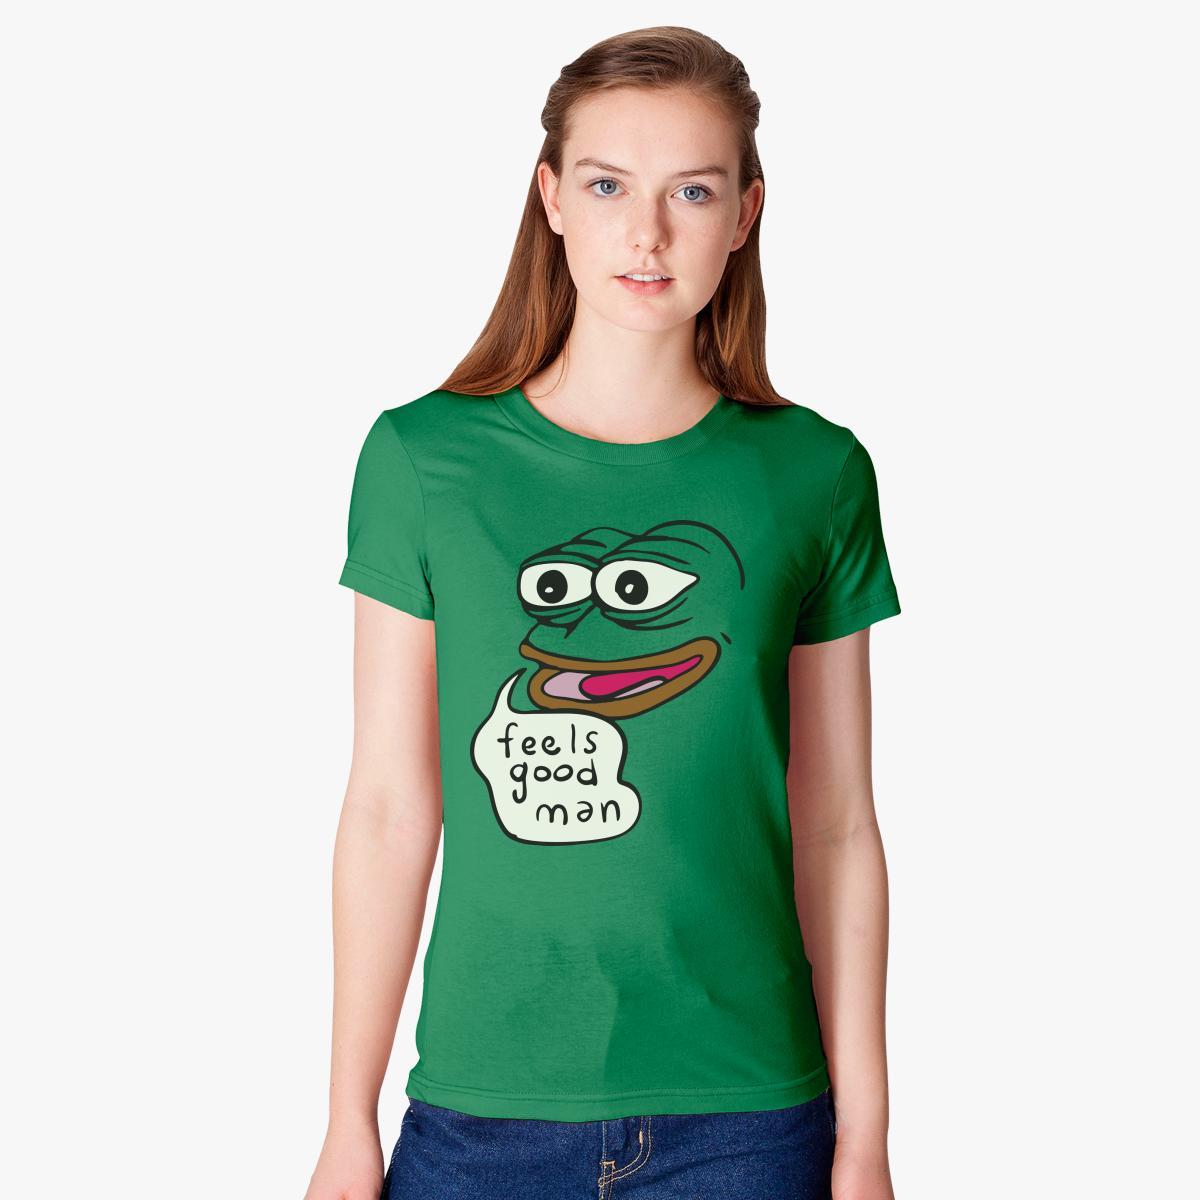 Feels Good Man Womenu0027s T Shirt